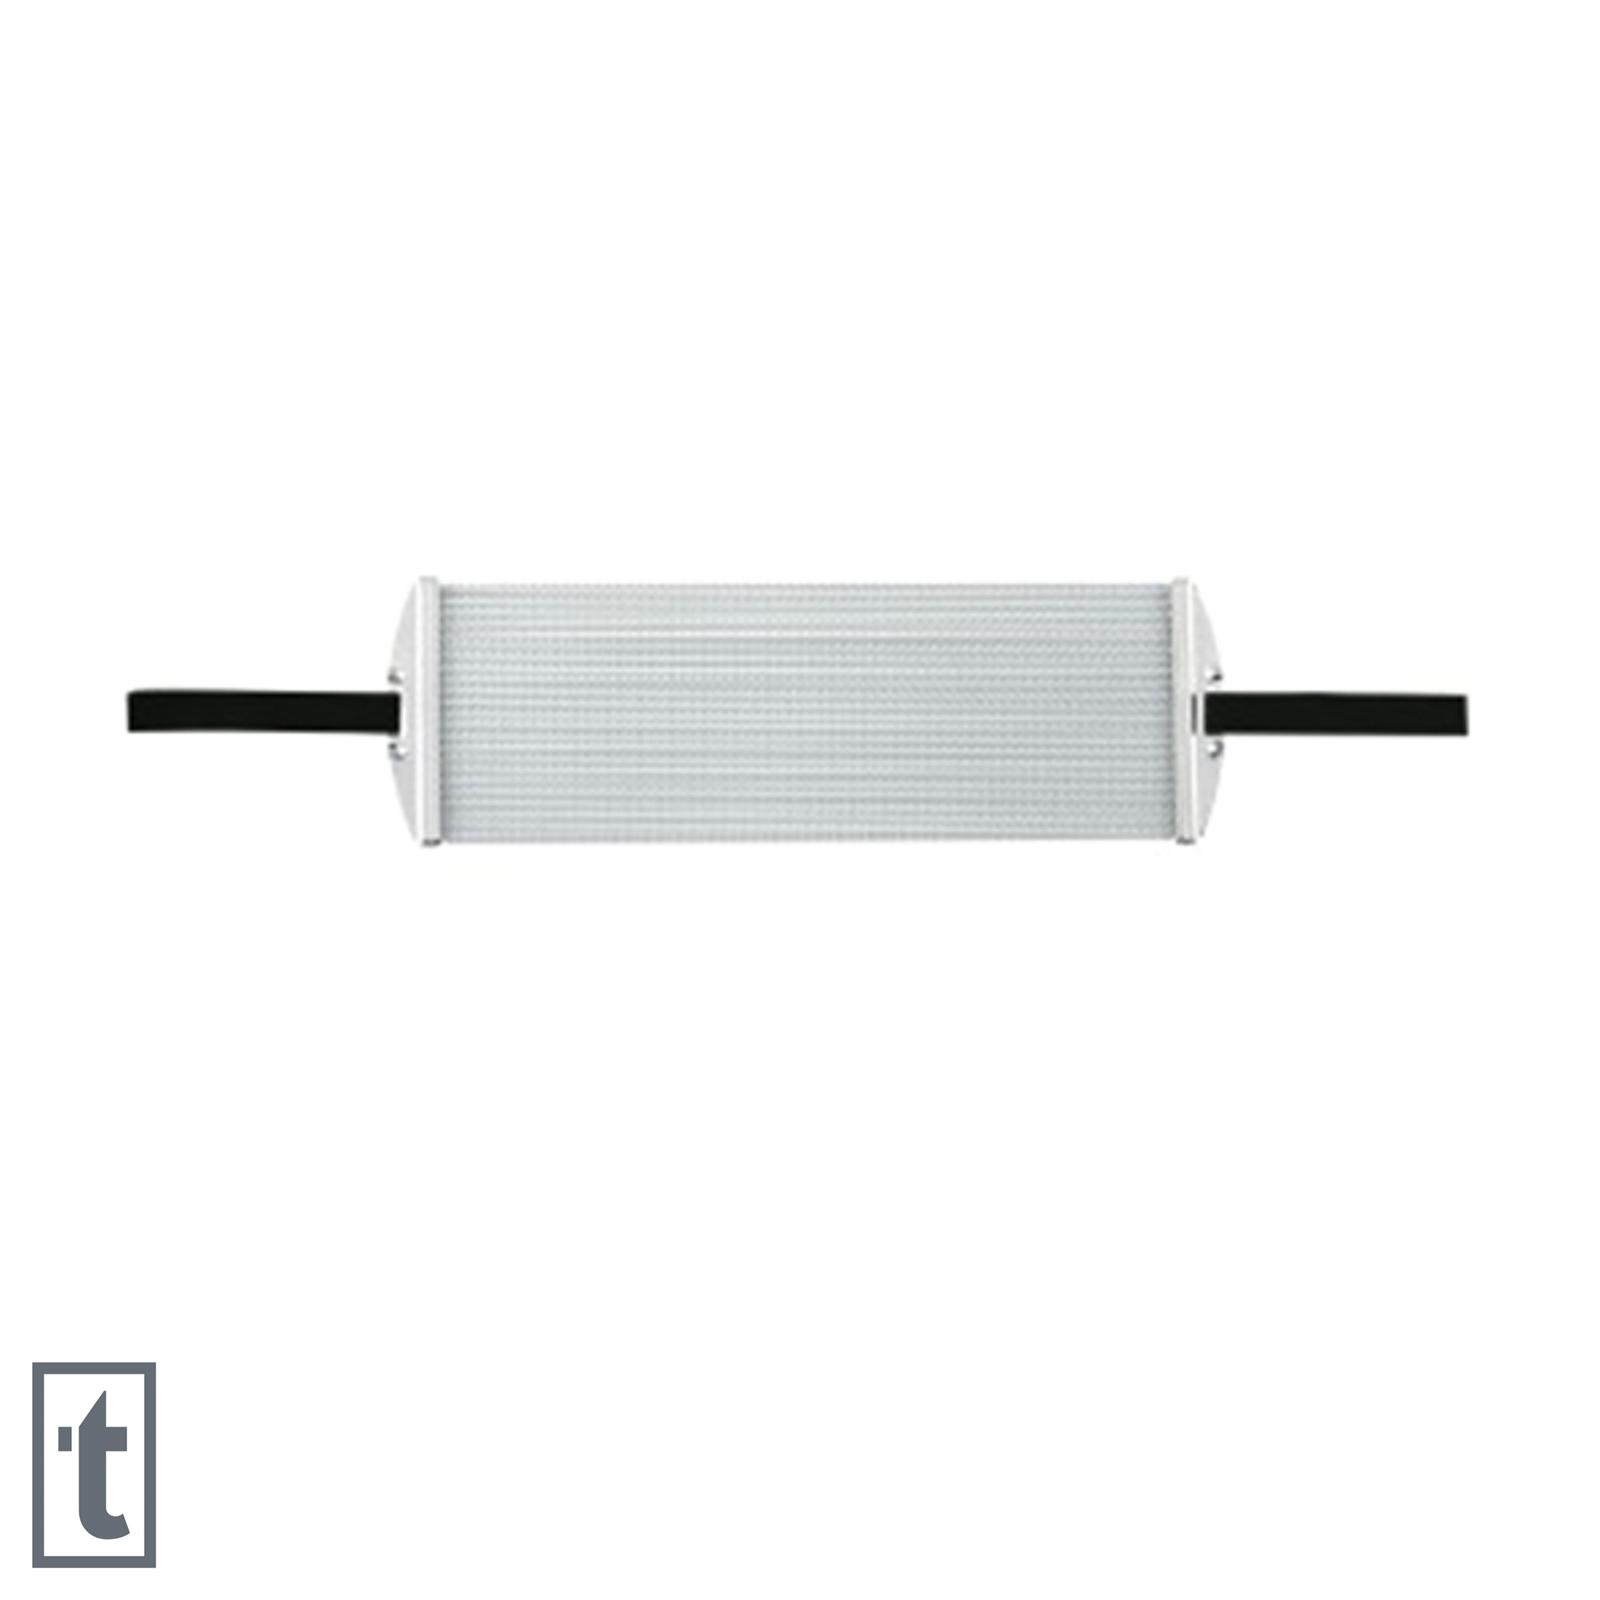 "Tama MS42R14S 14"" 42-strand Steel Regular Snare Wire - Esteira"